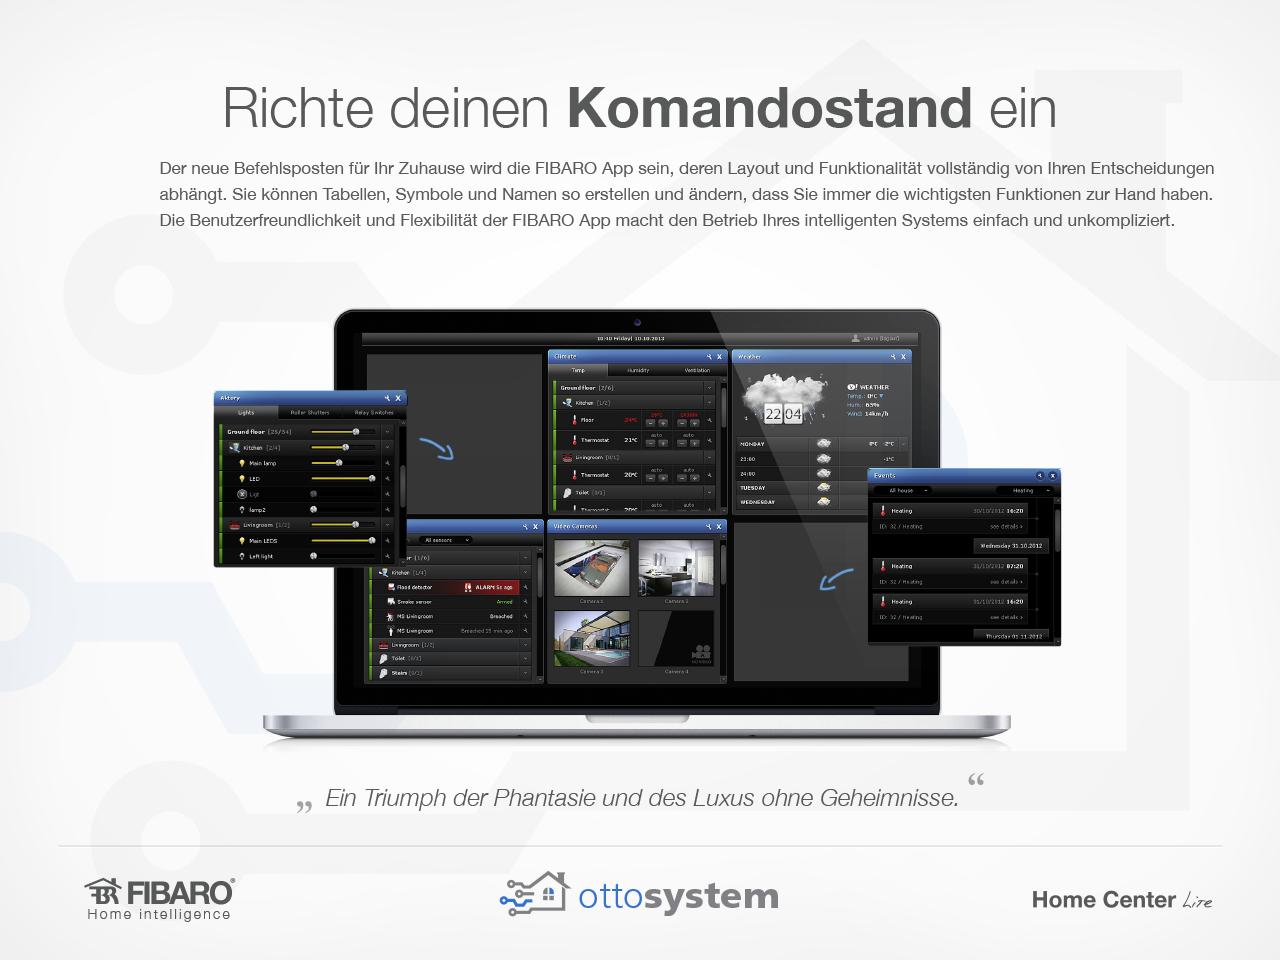 Pr-sentation_HCL_ottosystem-05